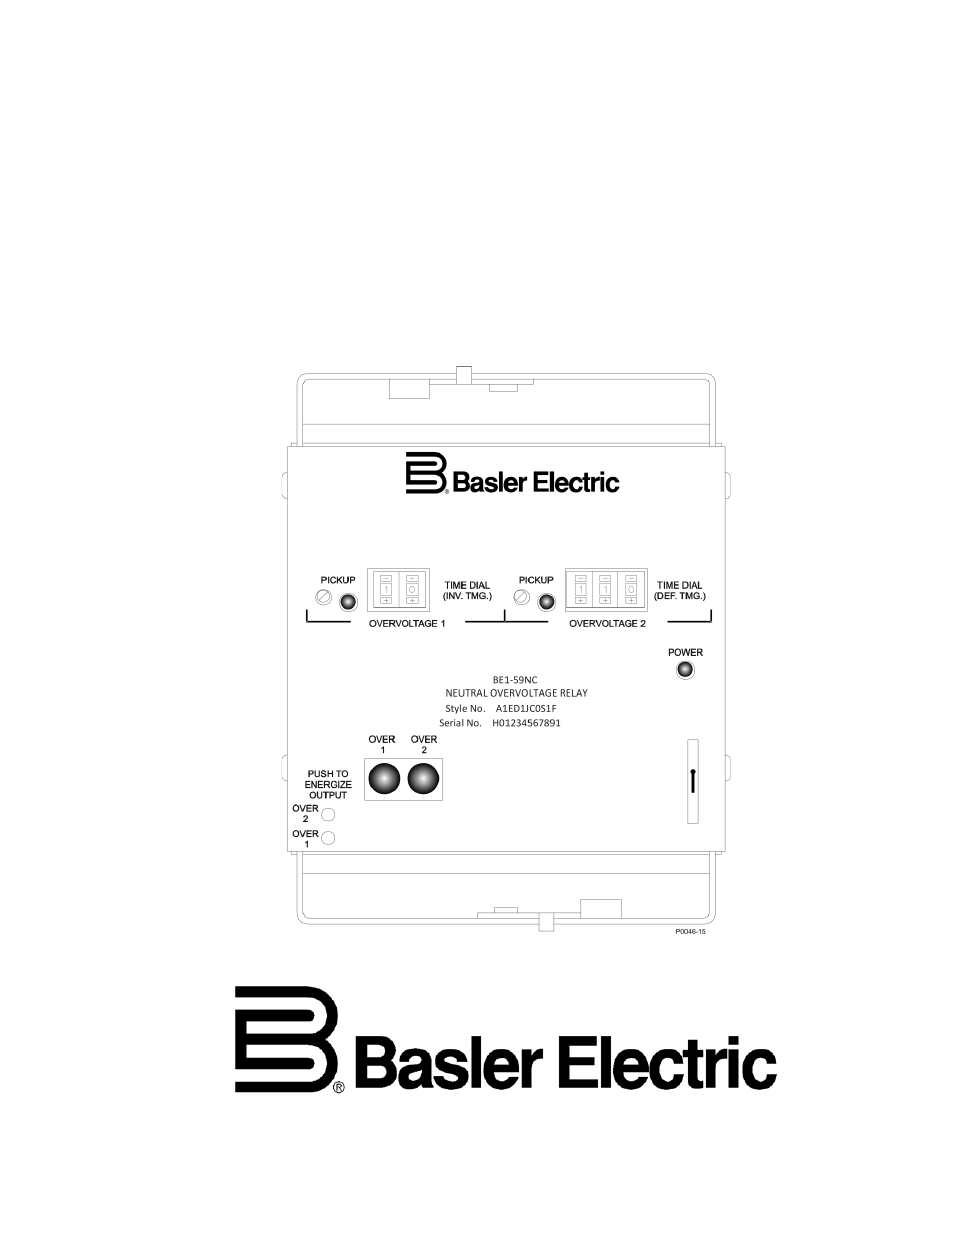 basler electric be1